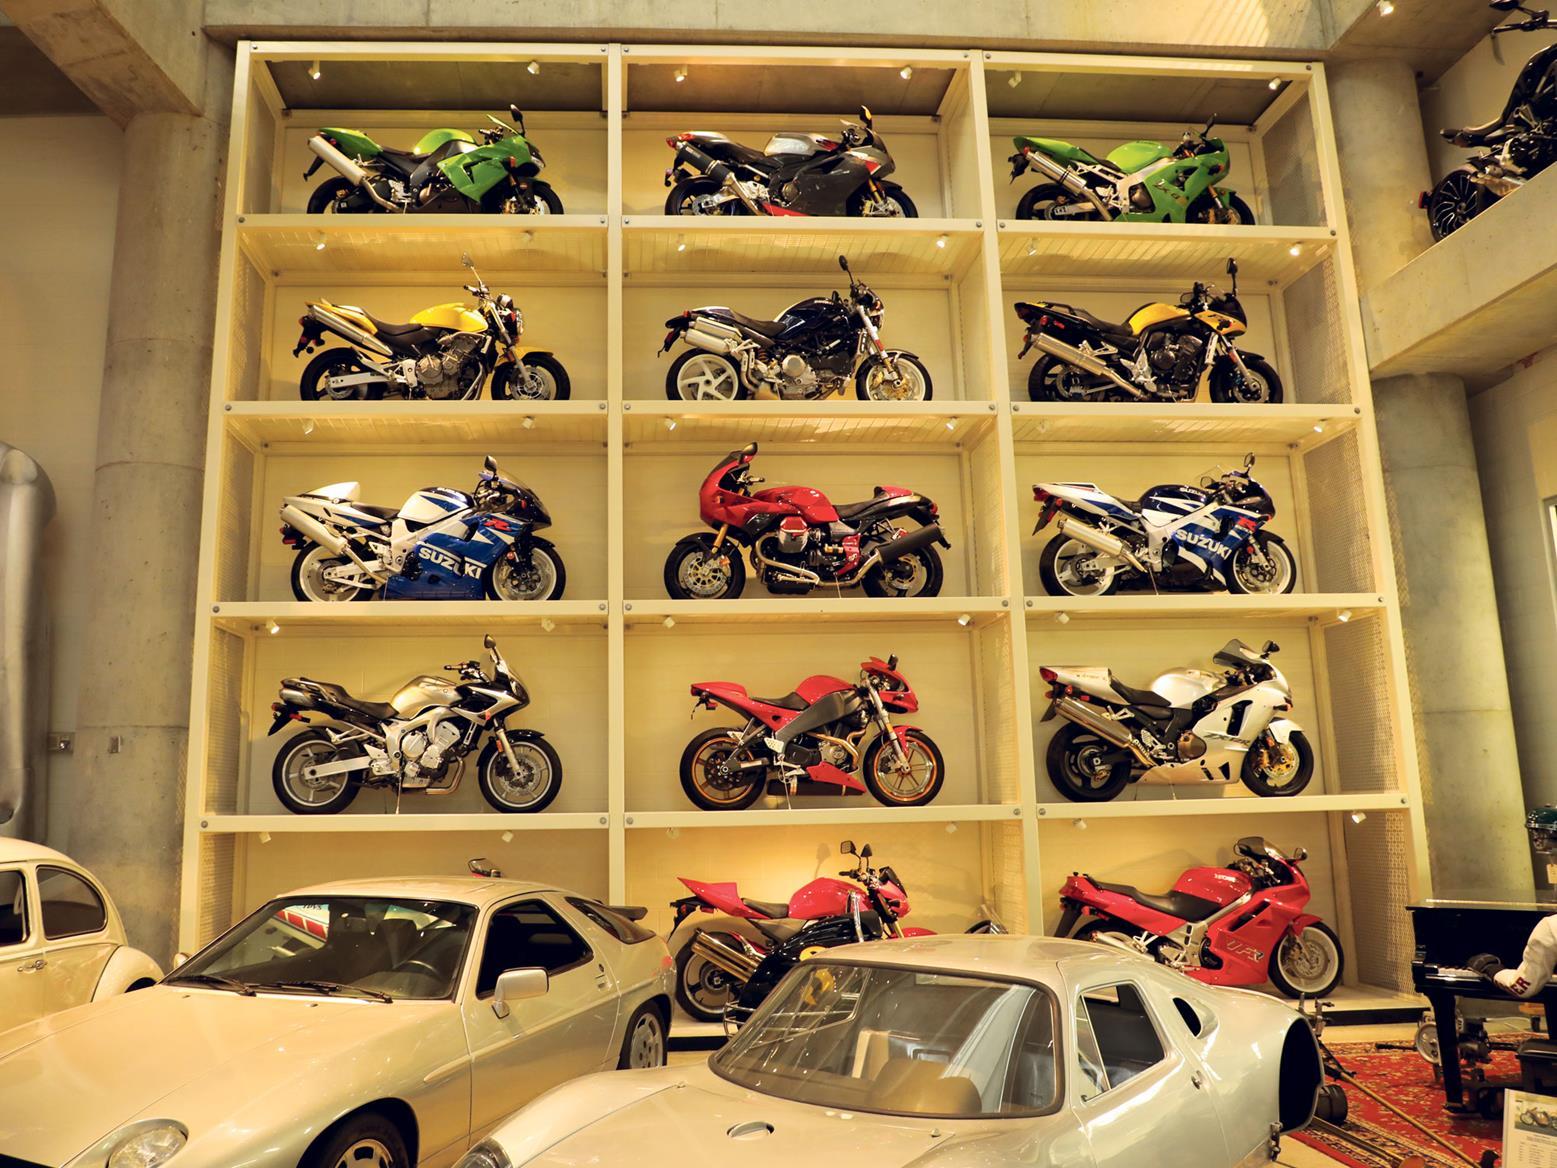 Bikes stored like matchbox toys